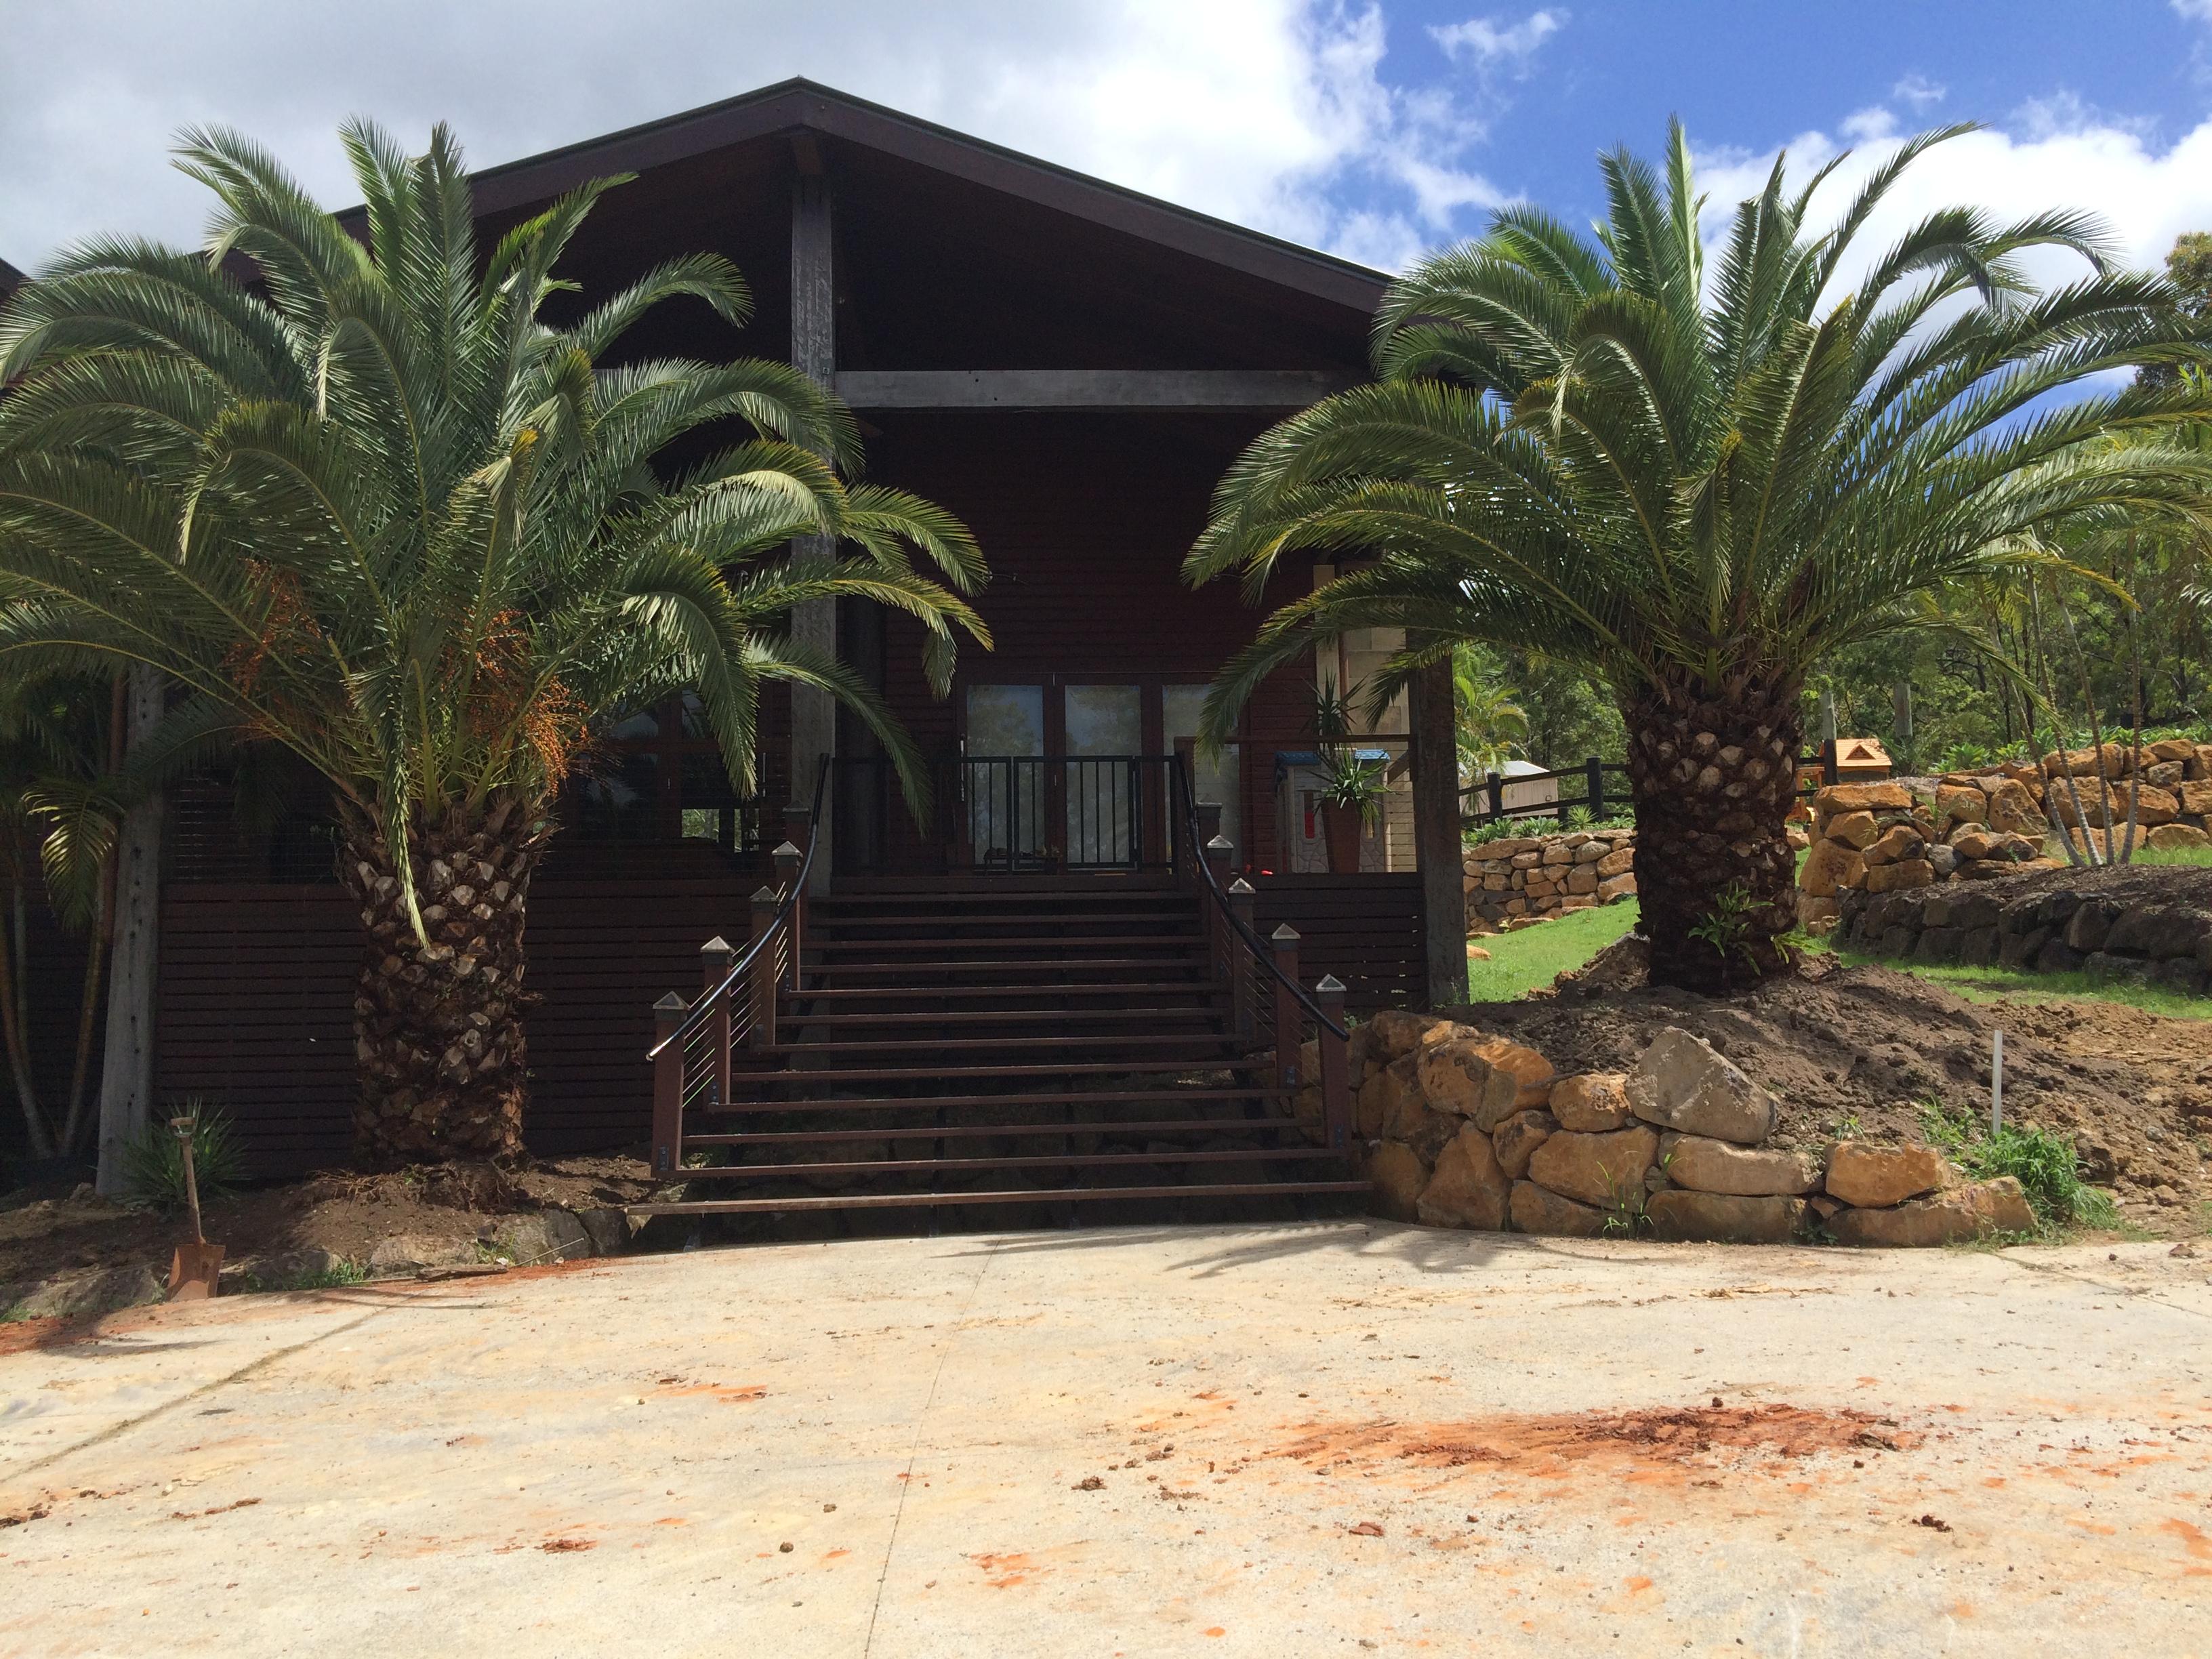 Canary island date palm for sale brisbane